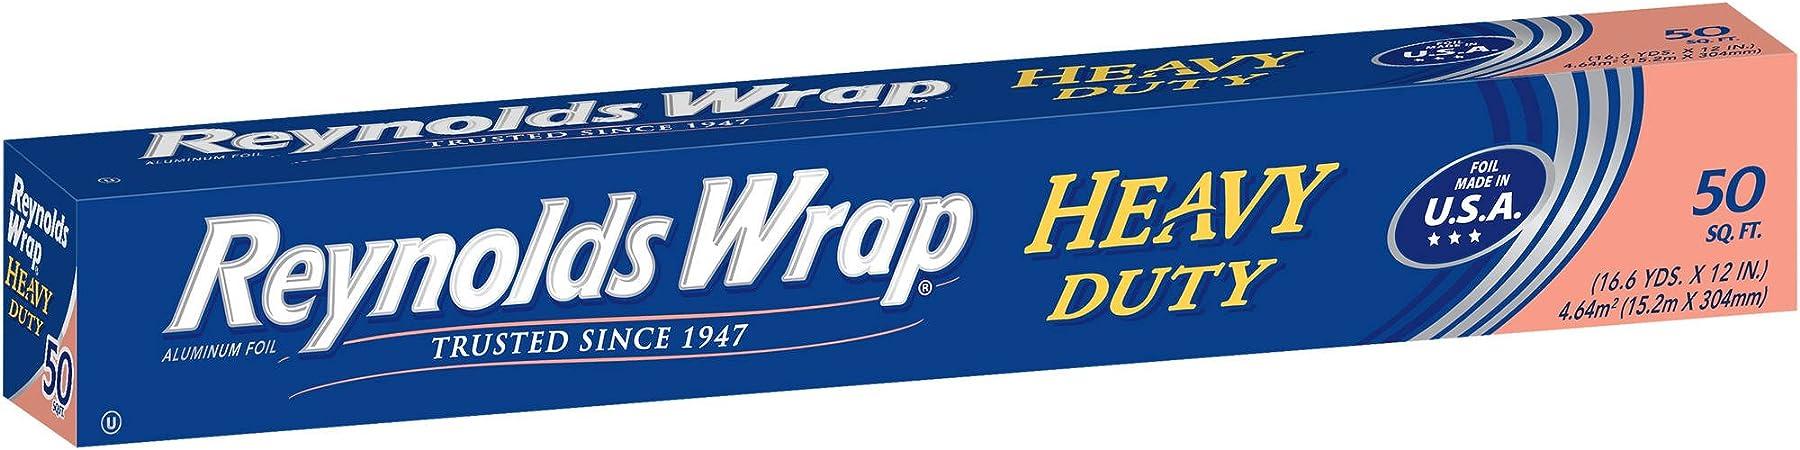 Reynold/'s Wrap Heavy Duty Aluminum Foil 50 sq ft Pack of 2